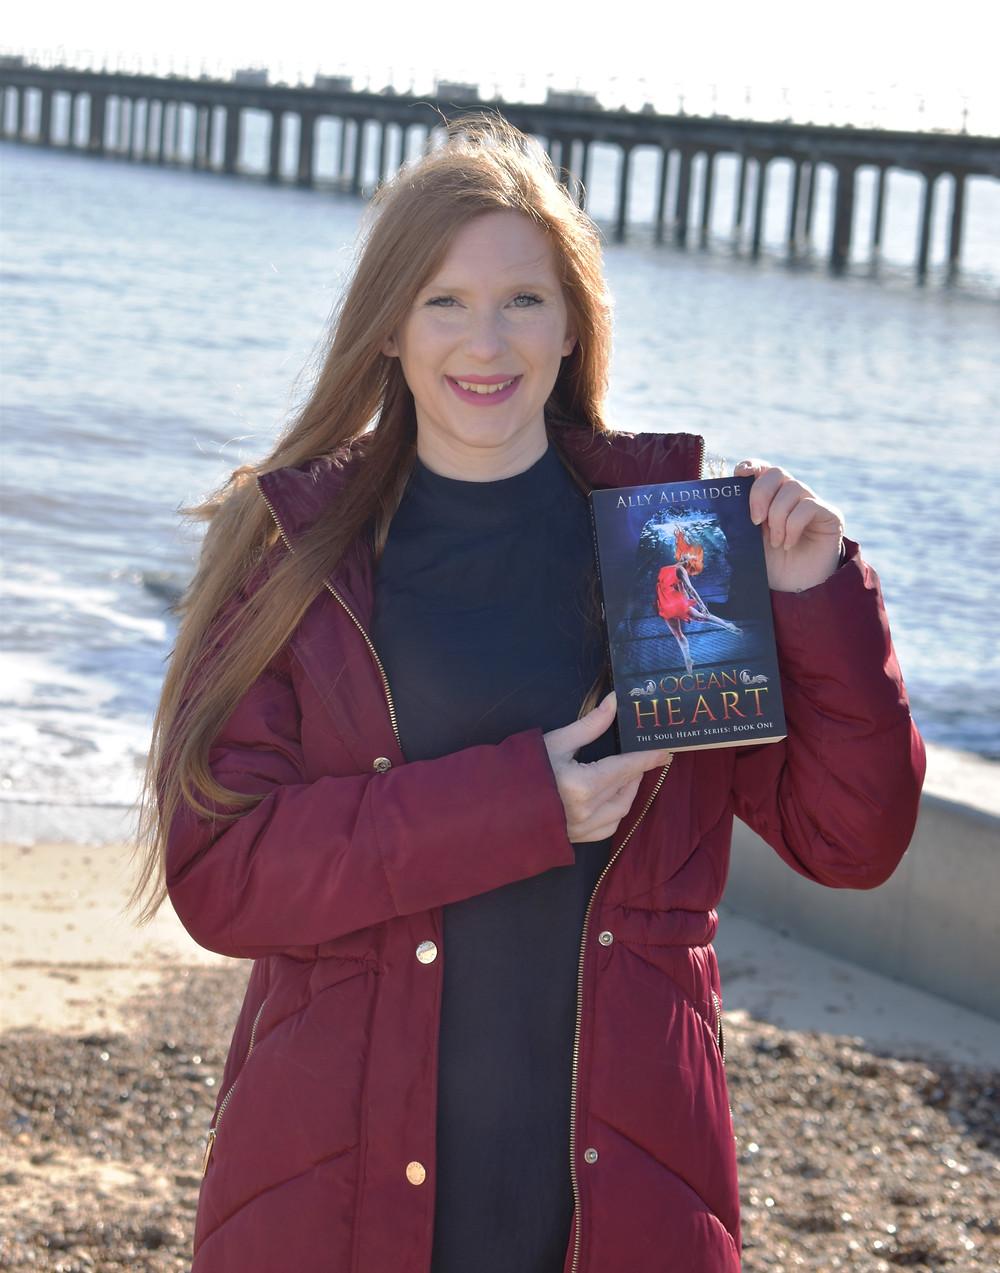 Ally Aldridge - author of Ocean Heart